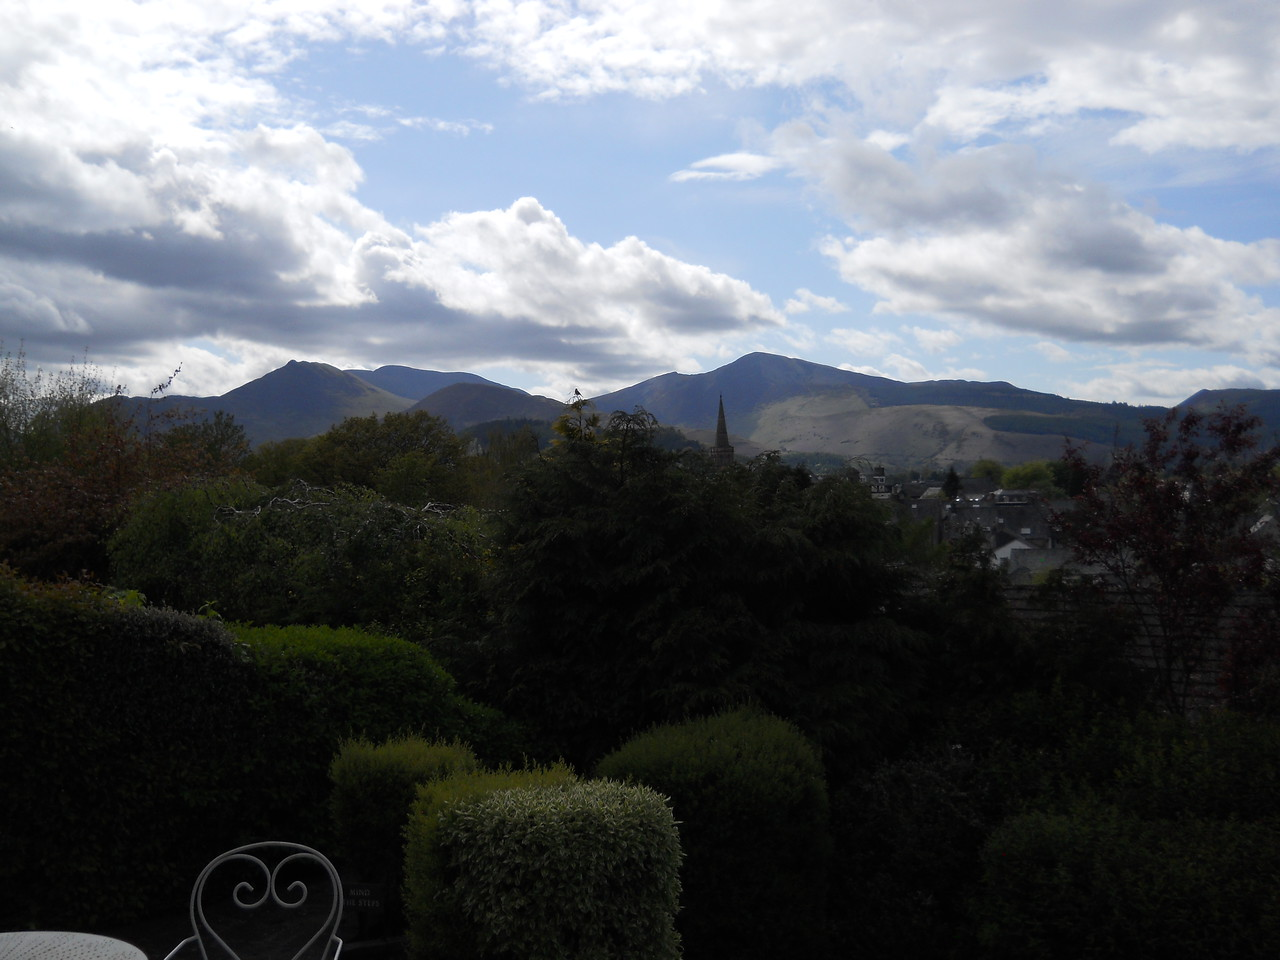 The views were fantastic